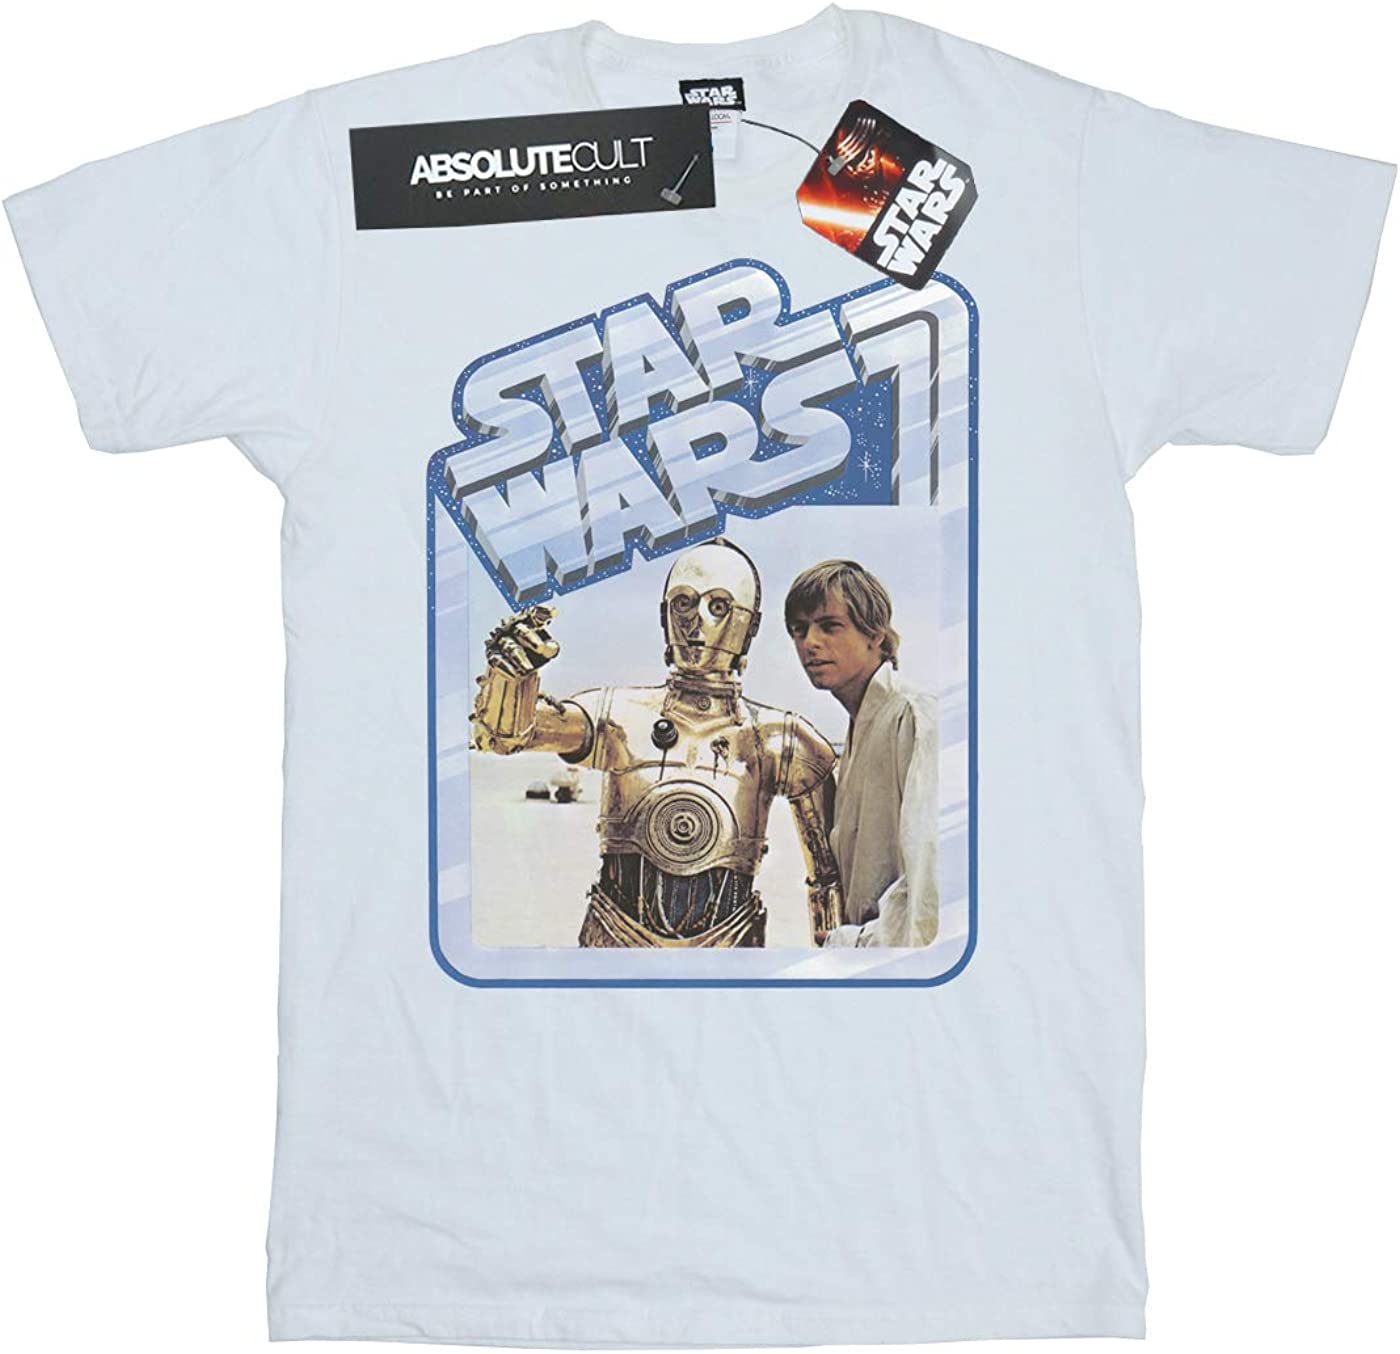 STAR WARS Girls Luke Skywalker and C-3PO T-Shirt 9-11 Years White